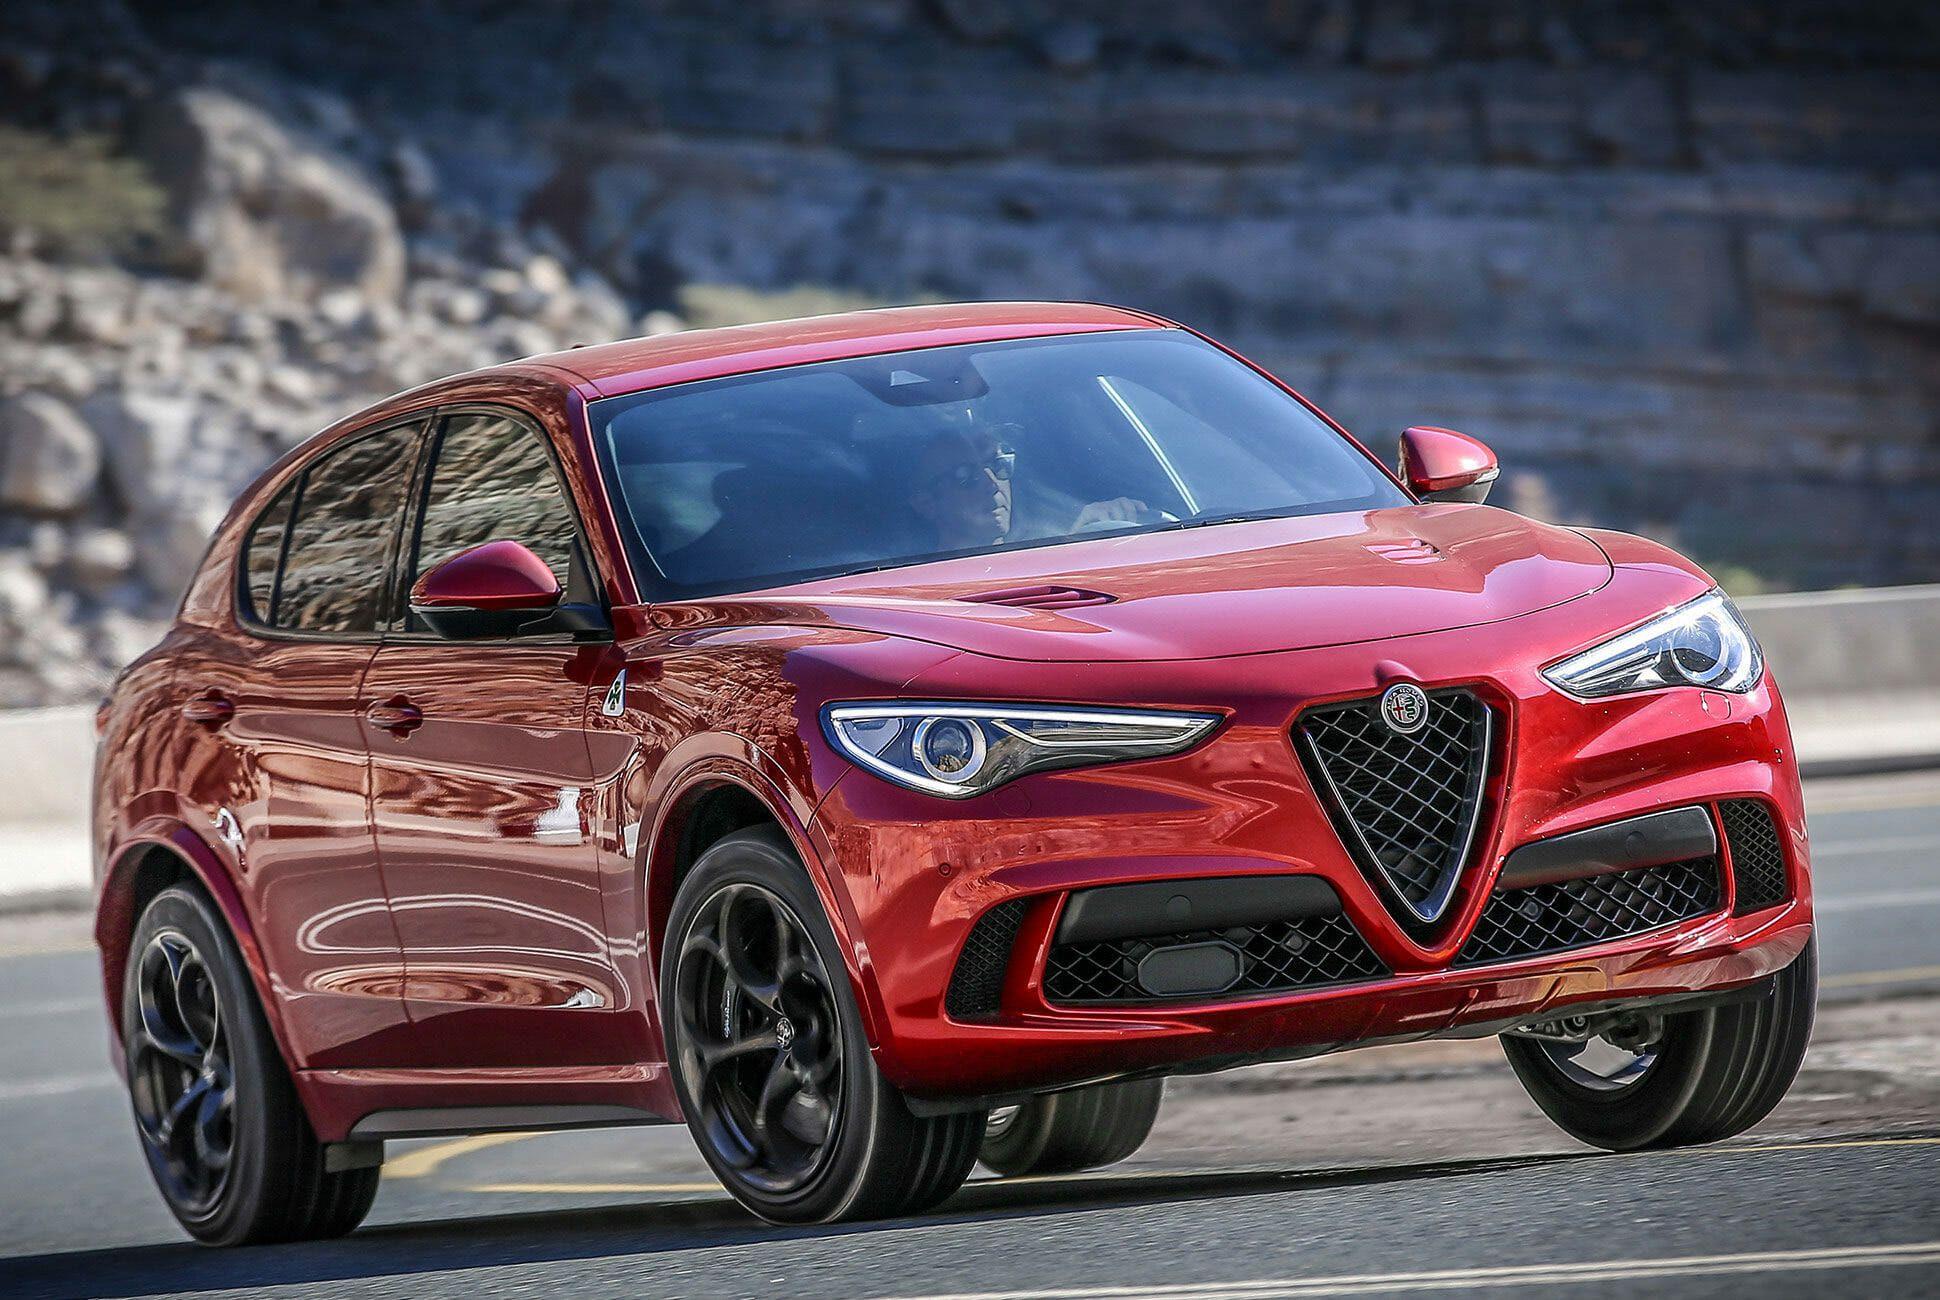 Alfa-Romeo-Quadrifoglio-Stelvia-and-Giulia-gear-patrol-slide-7